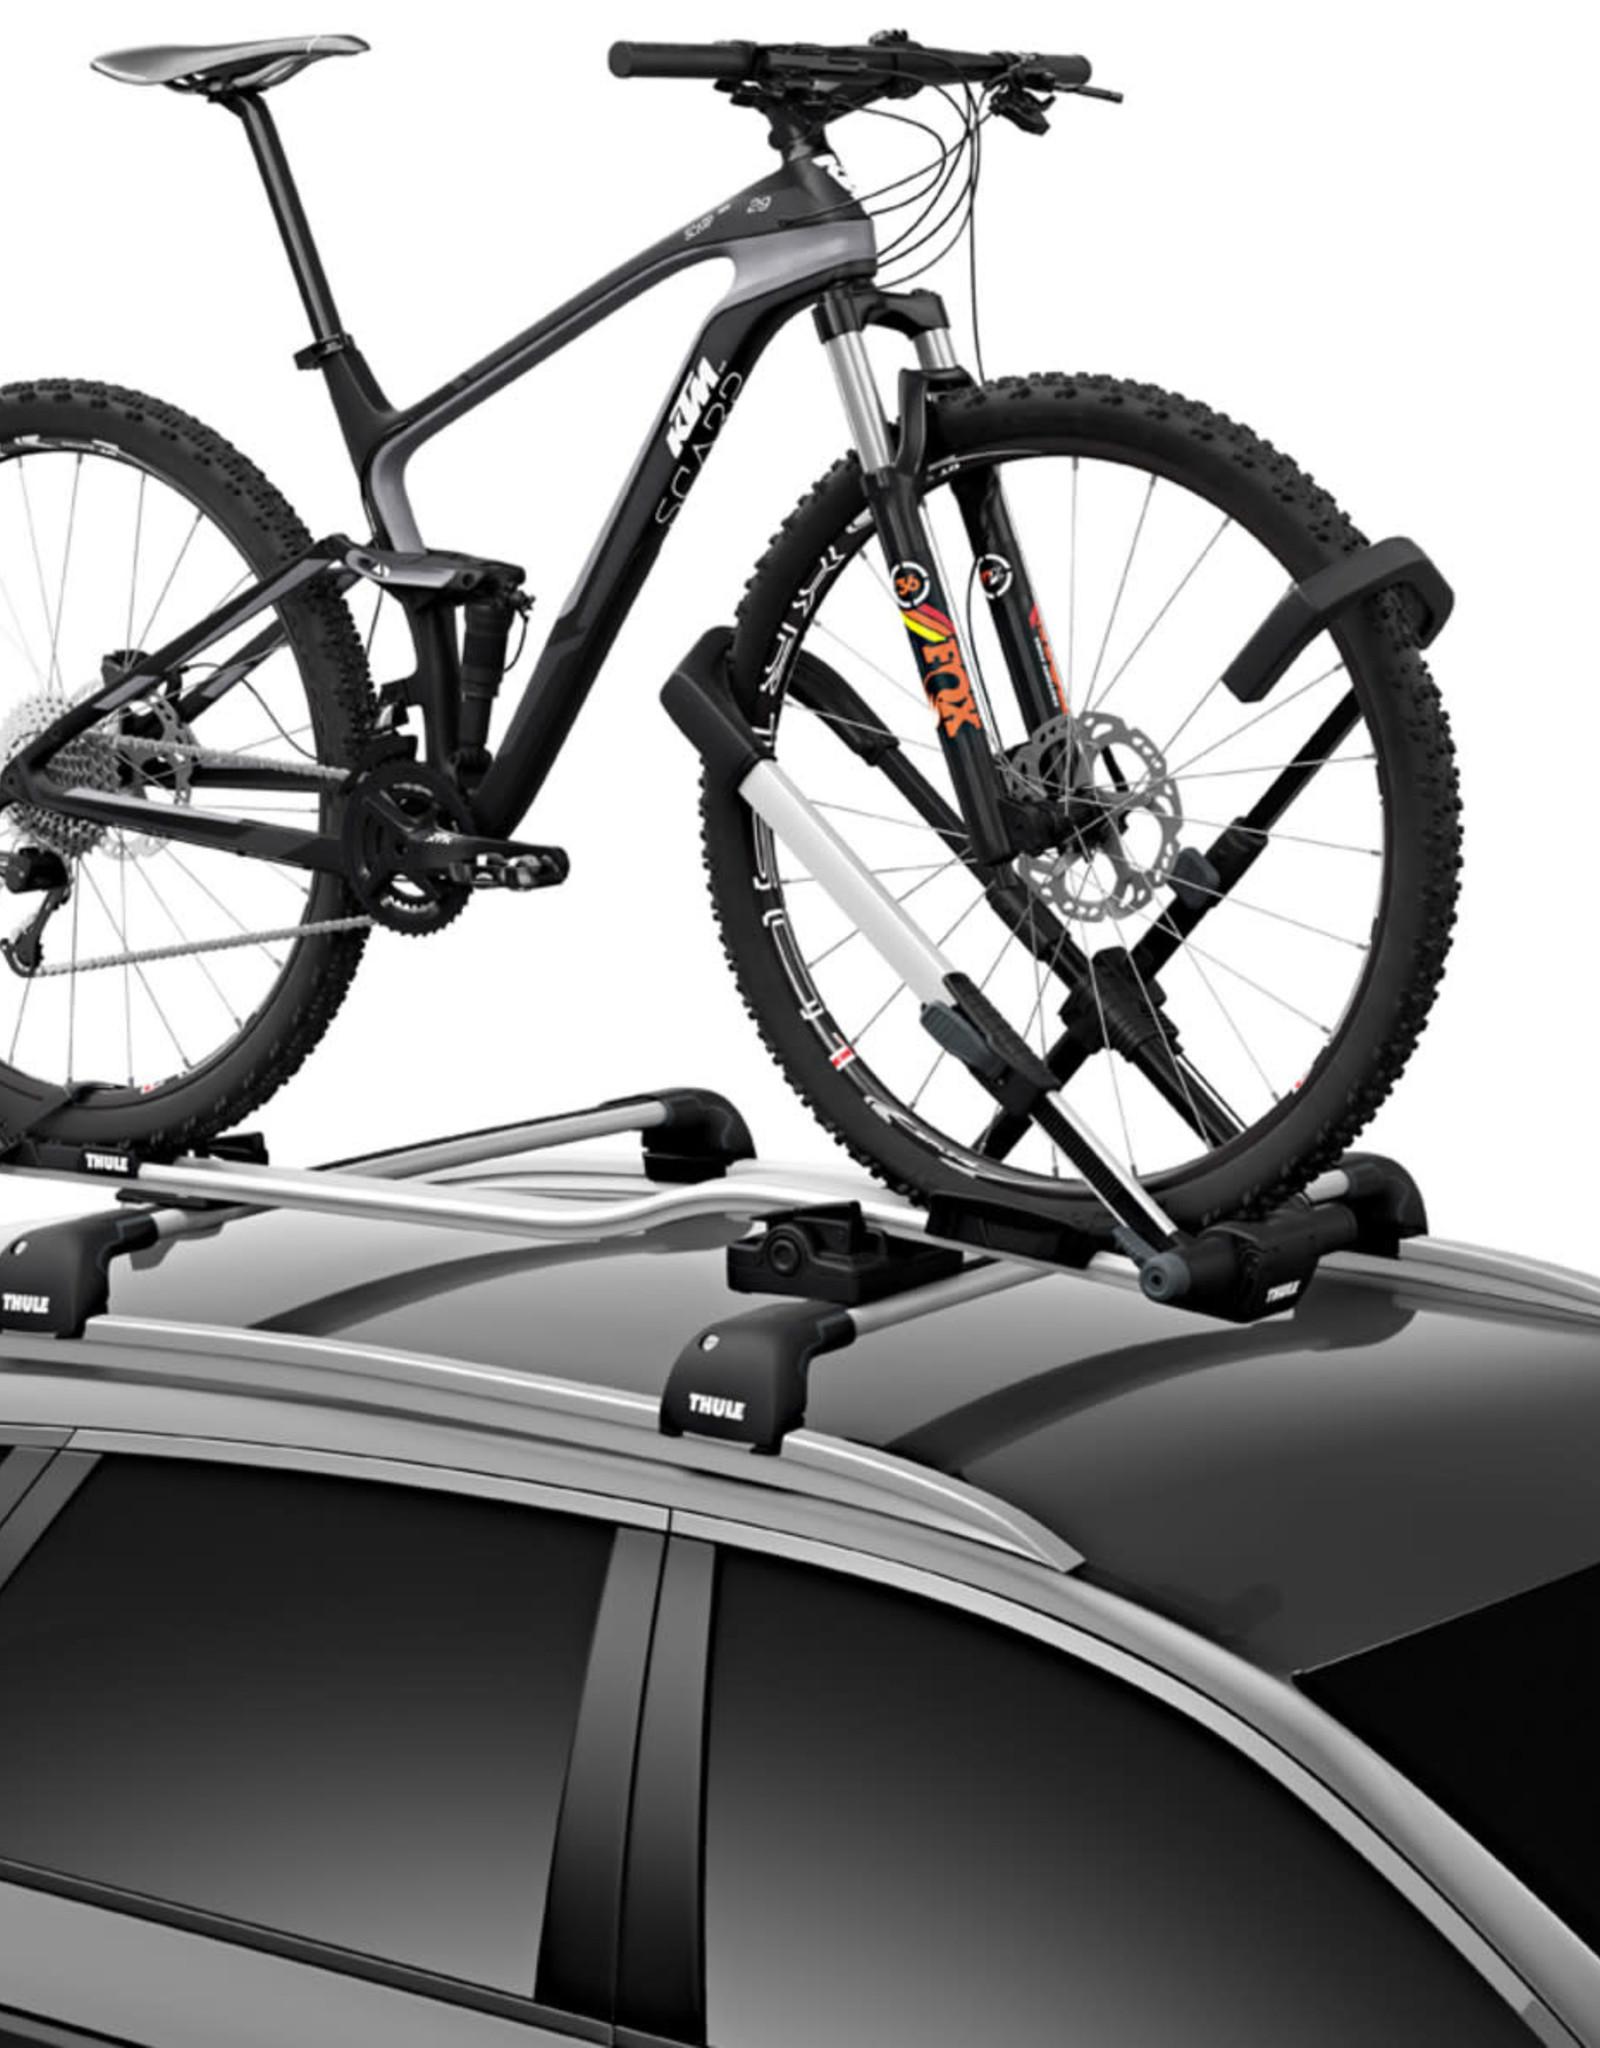 Thule Thule Upride Upright Roof Mount Bike Rack